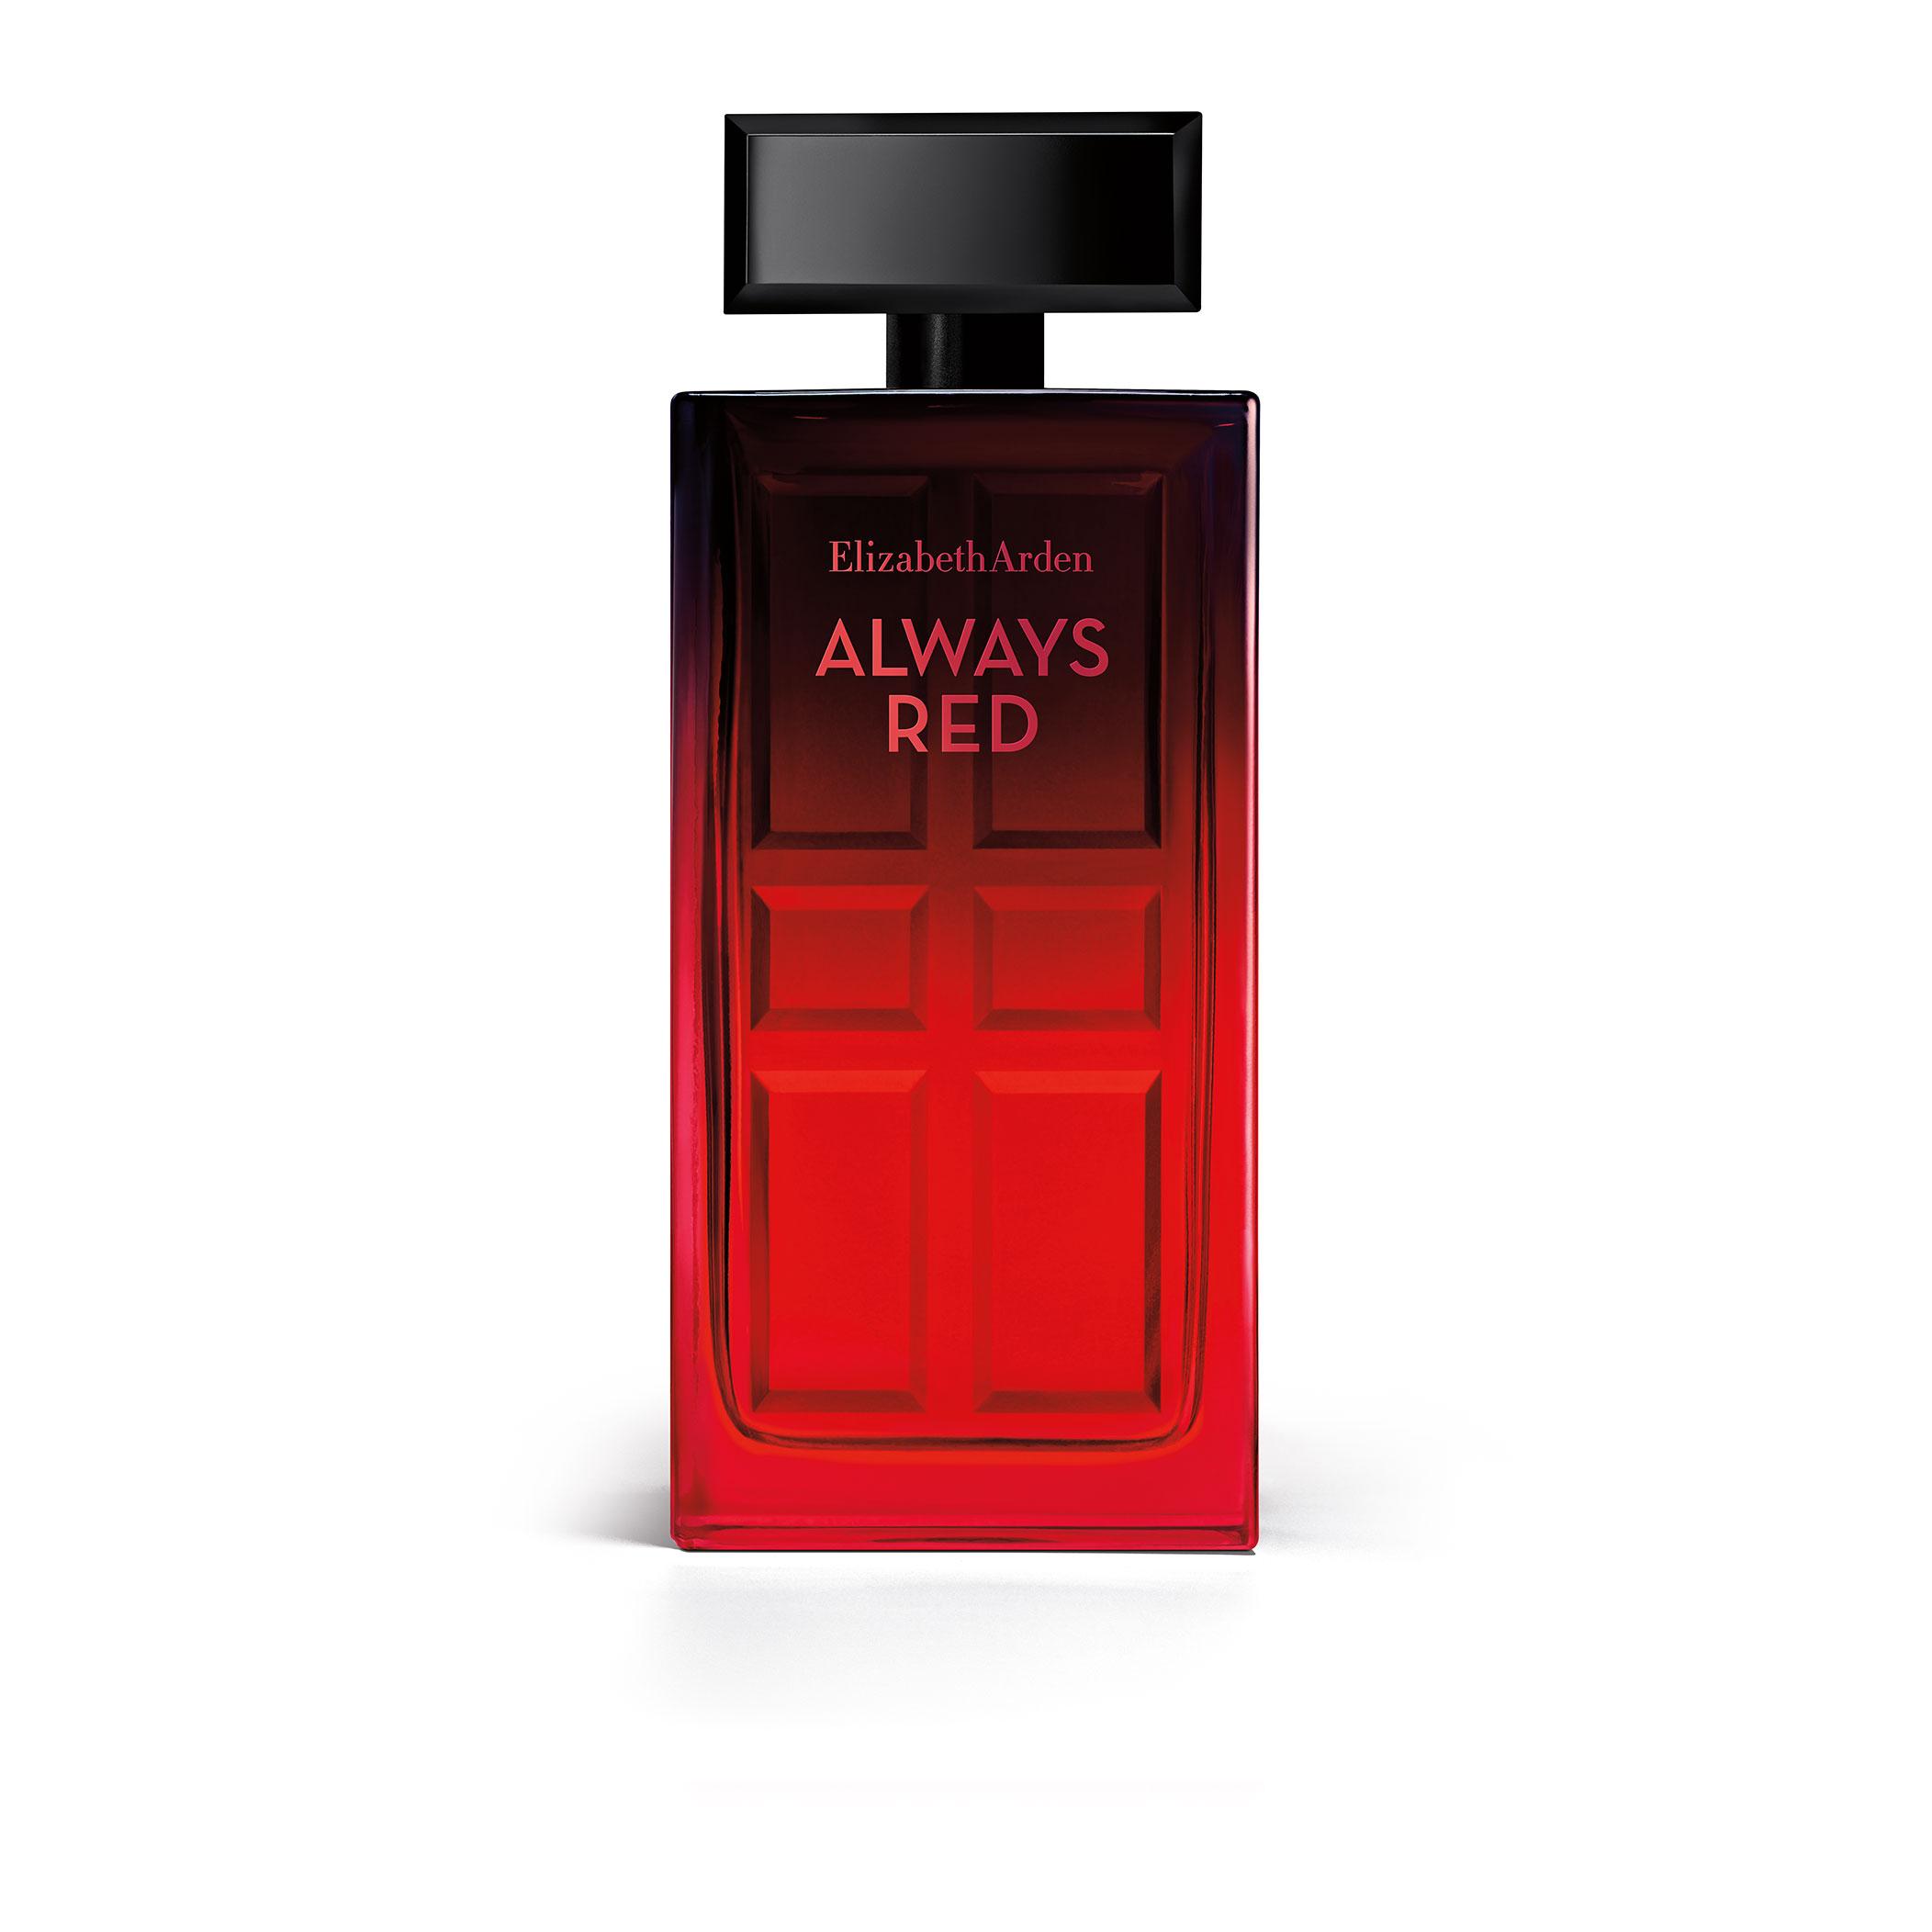 Elizabeth Arden Always Red Eau De Toilette Spray Perfume